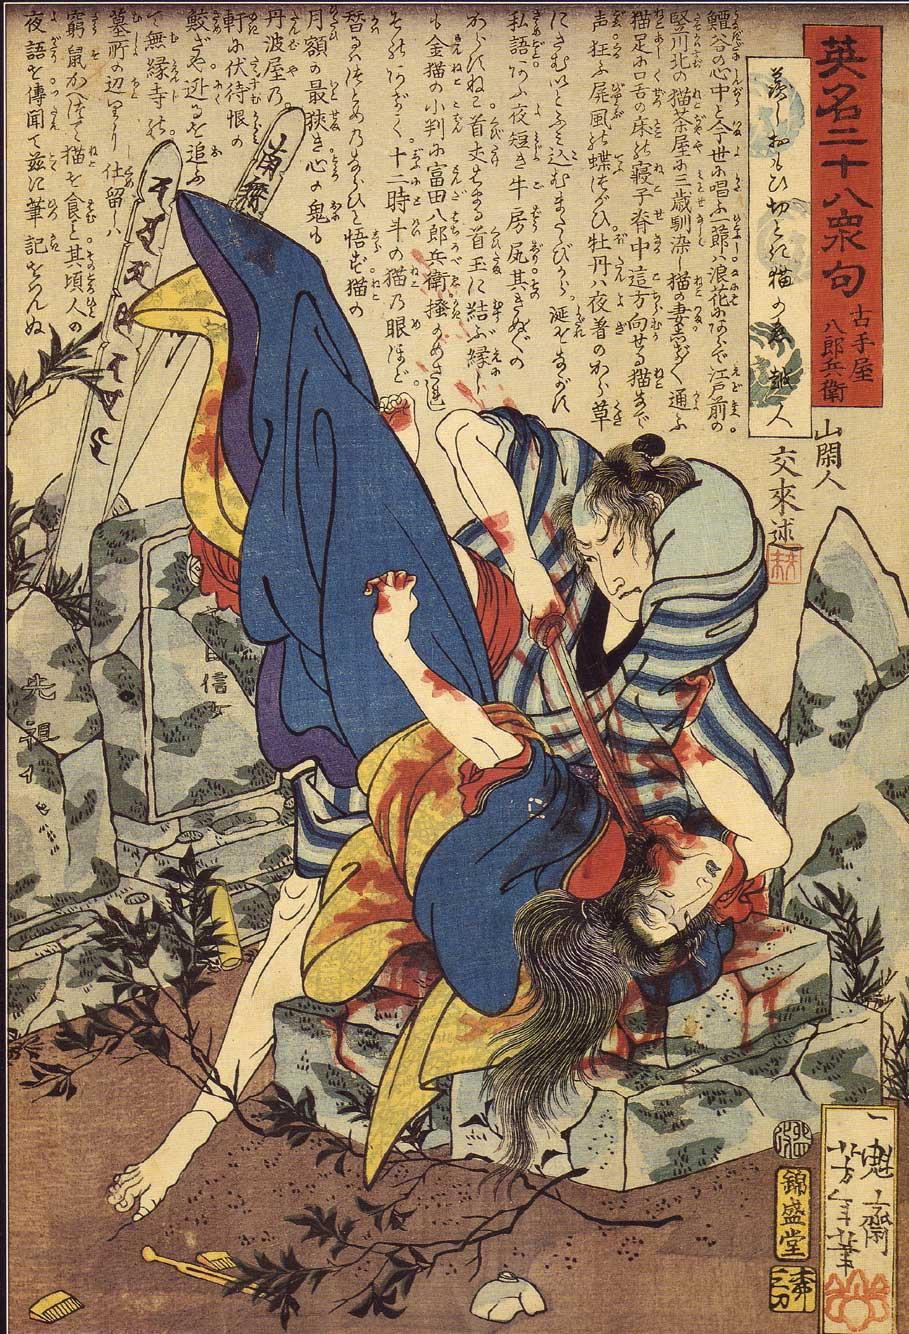 Tsukioka Yoshitoshi, Furuteya Hachirōbei murdering a woman in a graveyard, 9